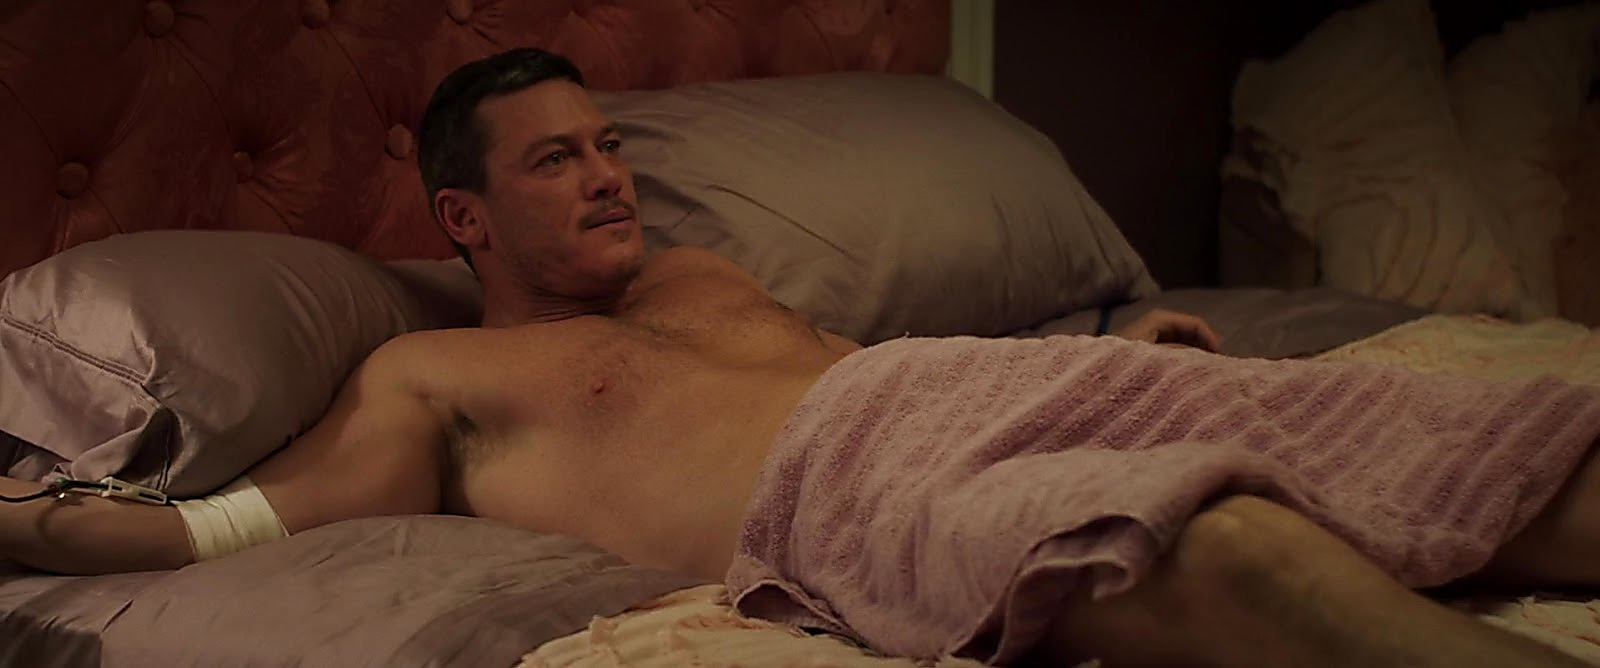 Luke Evans sexy shirtless scene August 15, 2019, 1pm